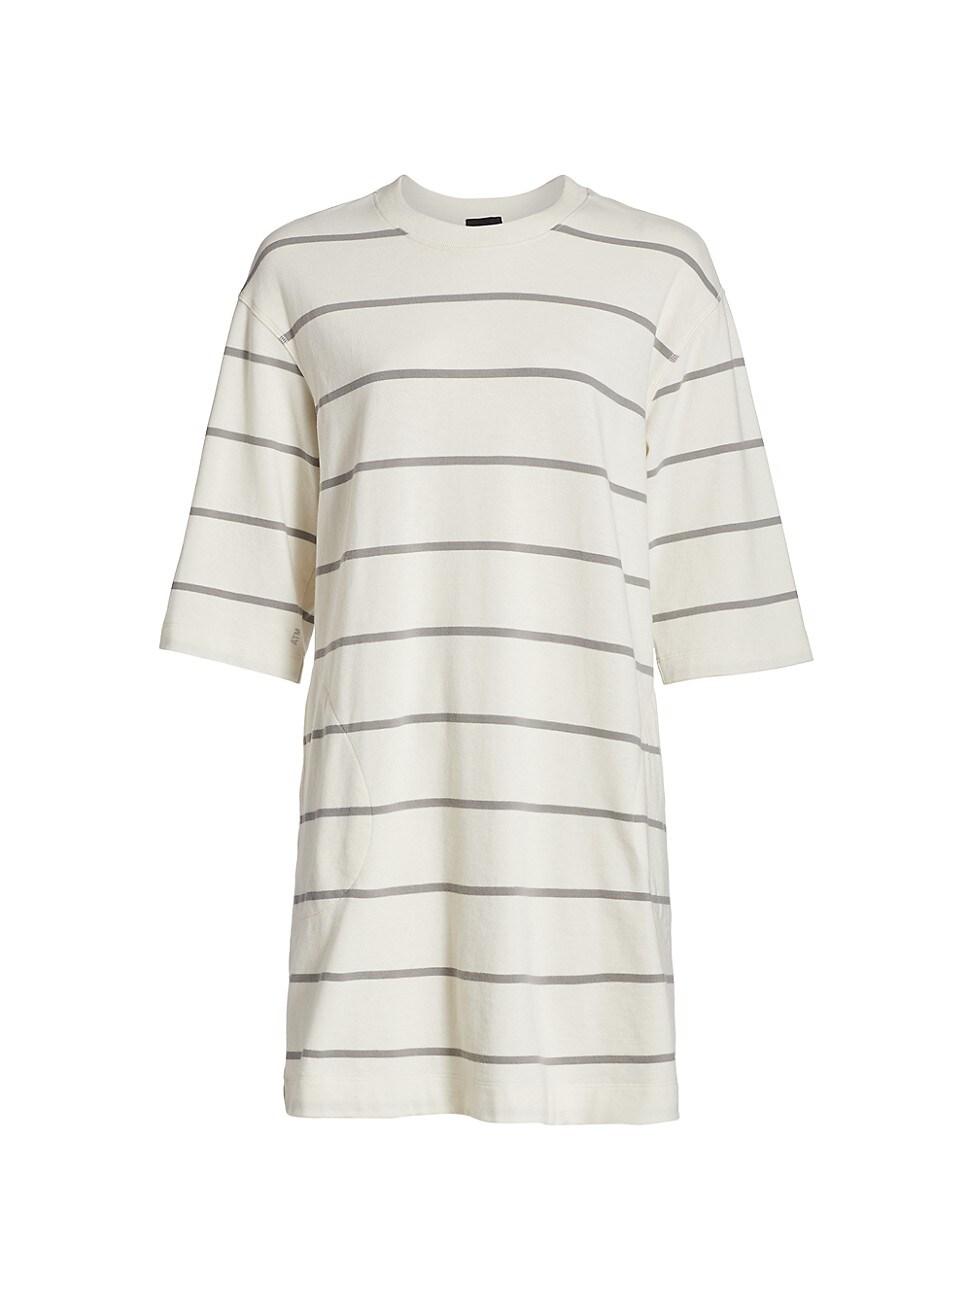 Atm Anthony Thomas Melillo WOMEN'S PLAITED JERSEY STRIPE T-SHIRT DRESS